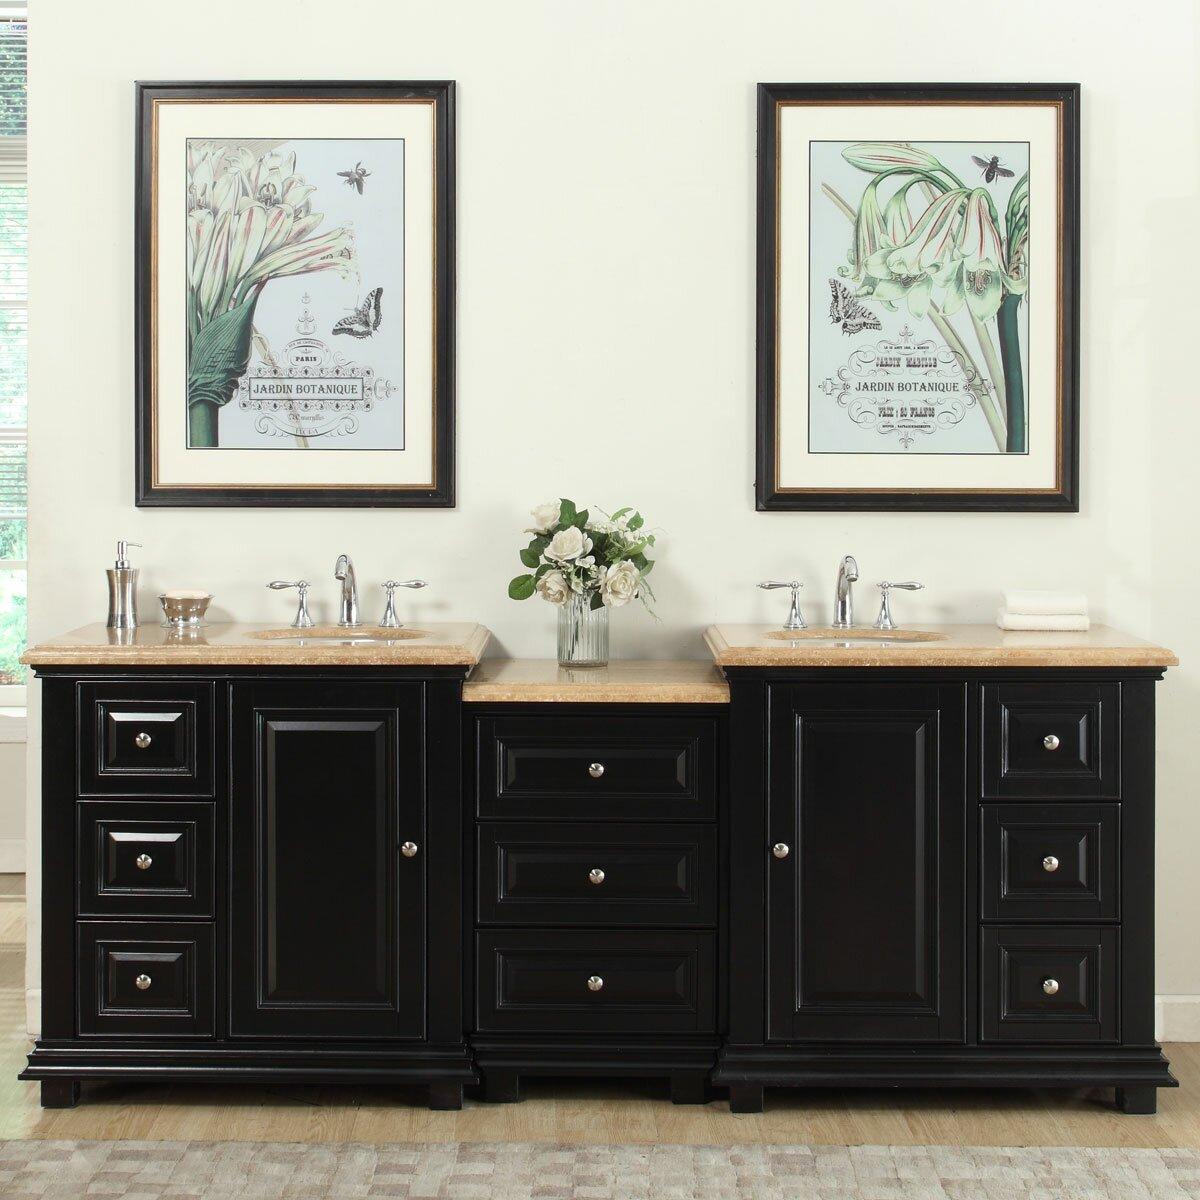 Silkroad exclusive 90 5 double sink bathroom modular for Modular bathroom